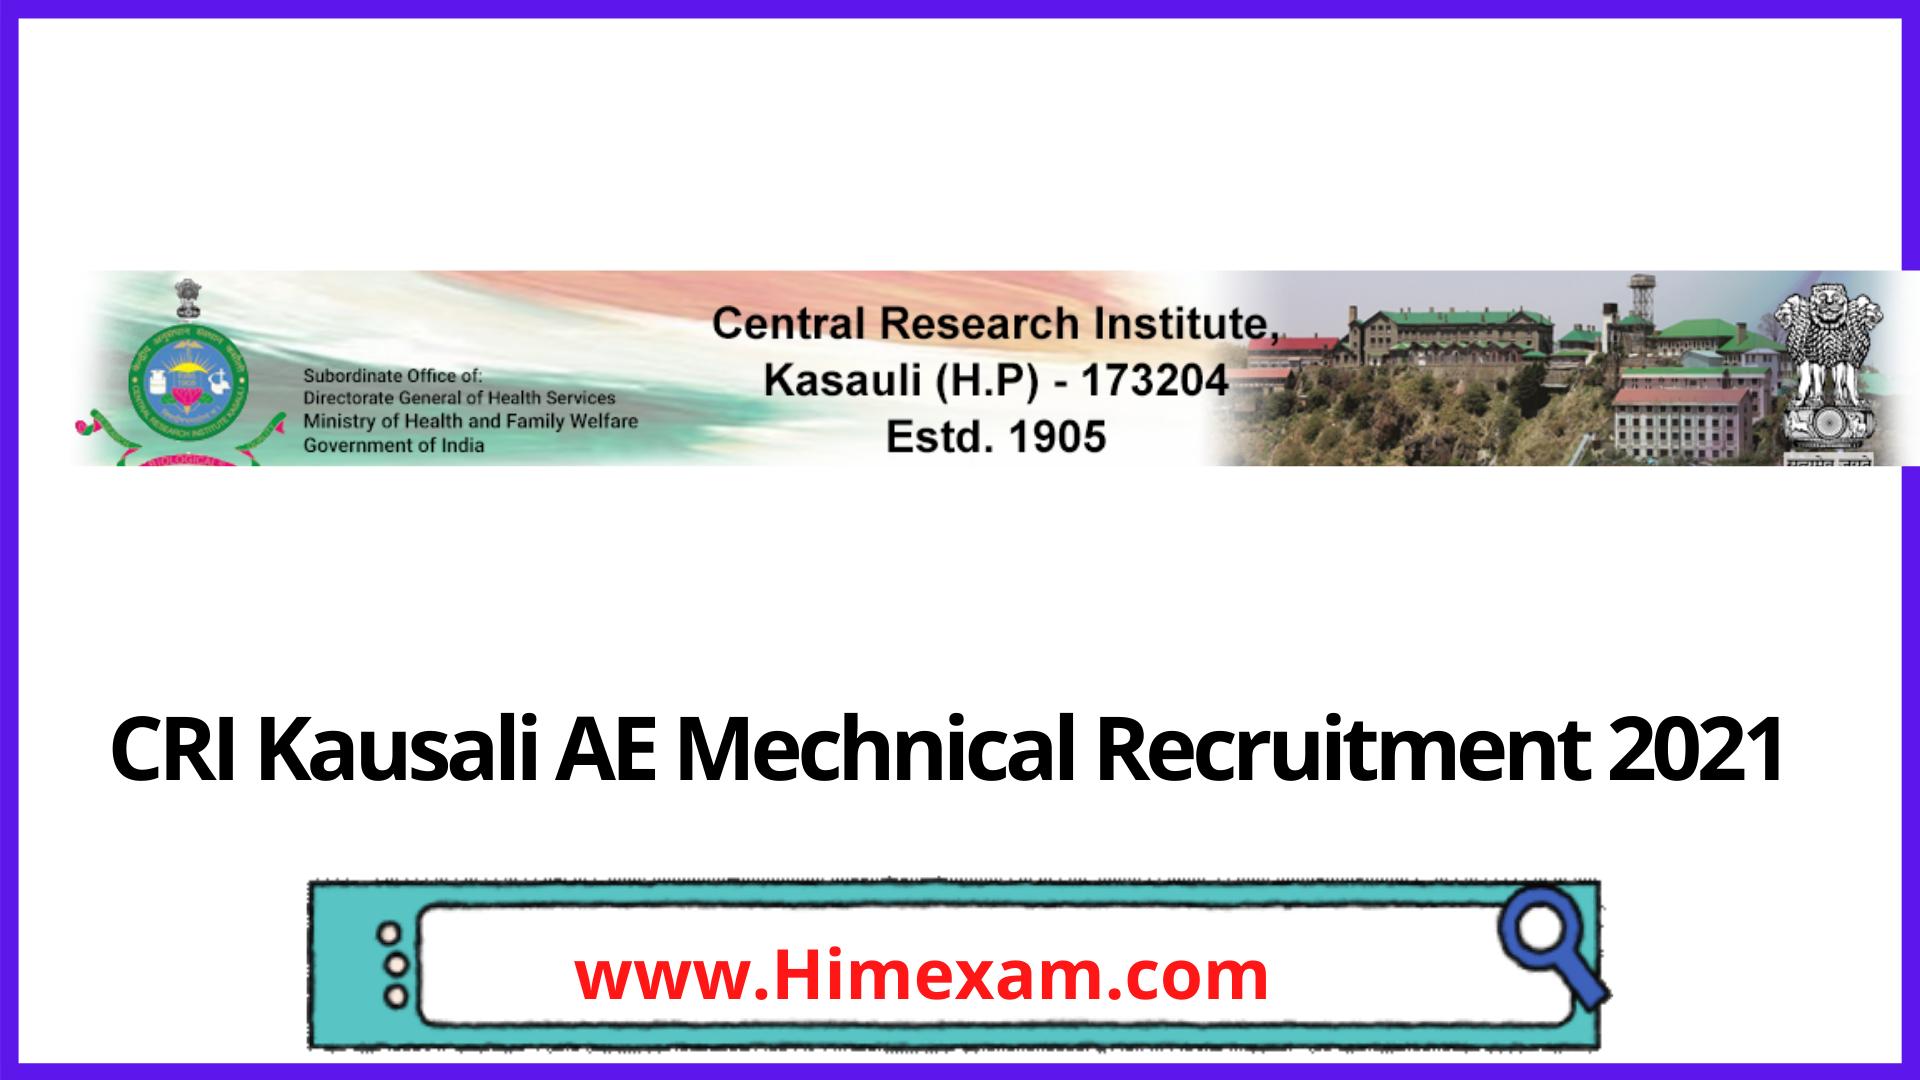 CRI Kausali AE Mechnical Recruitment 2021